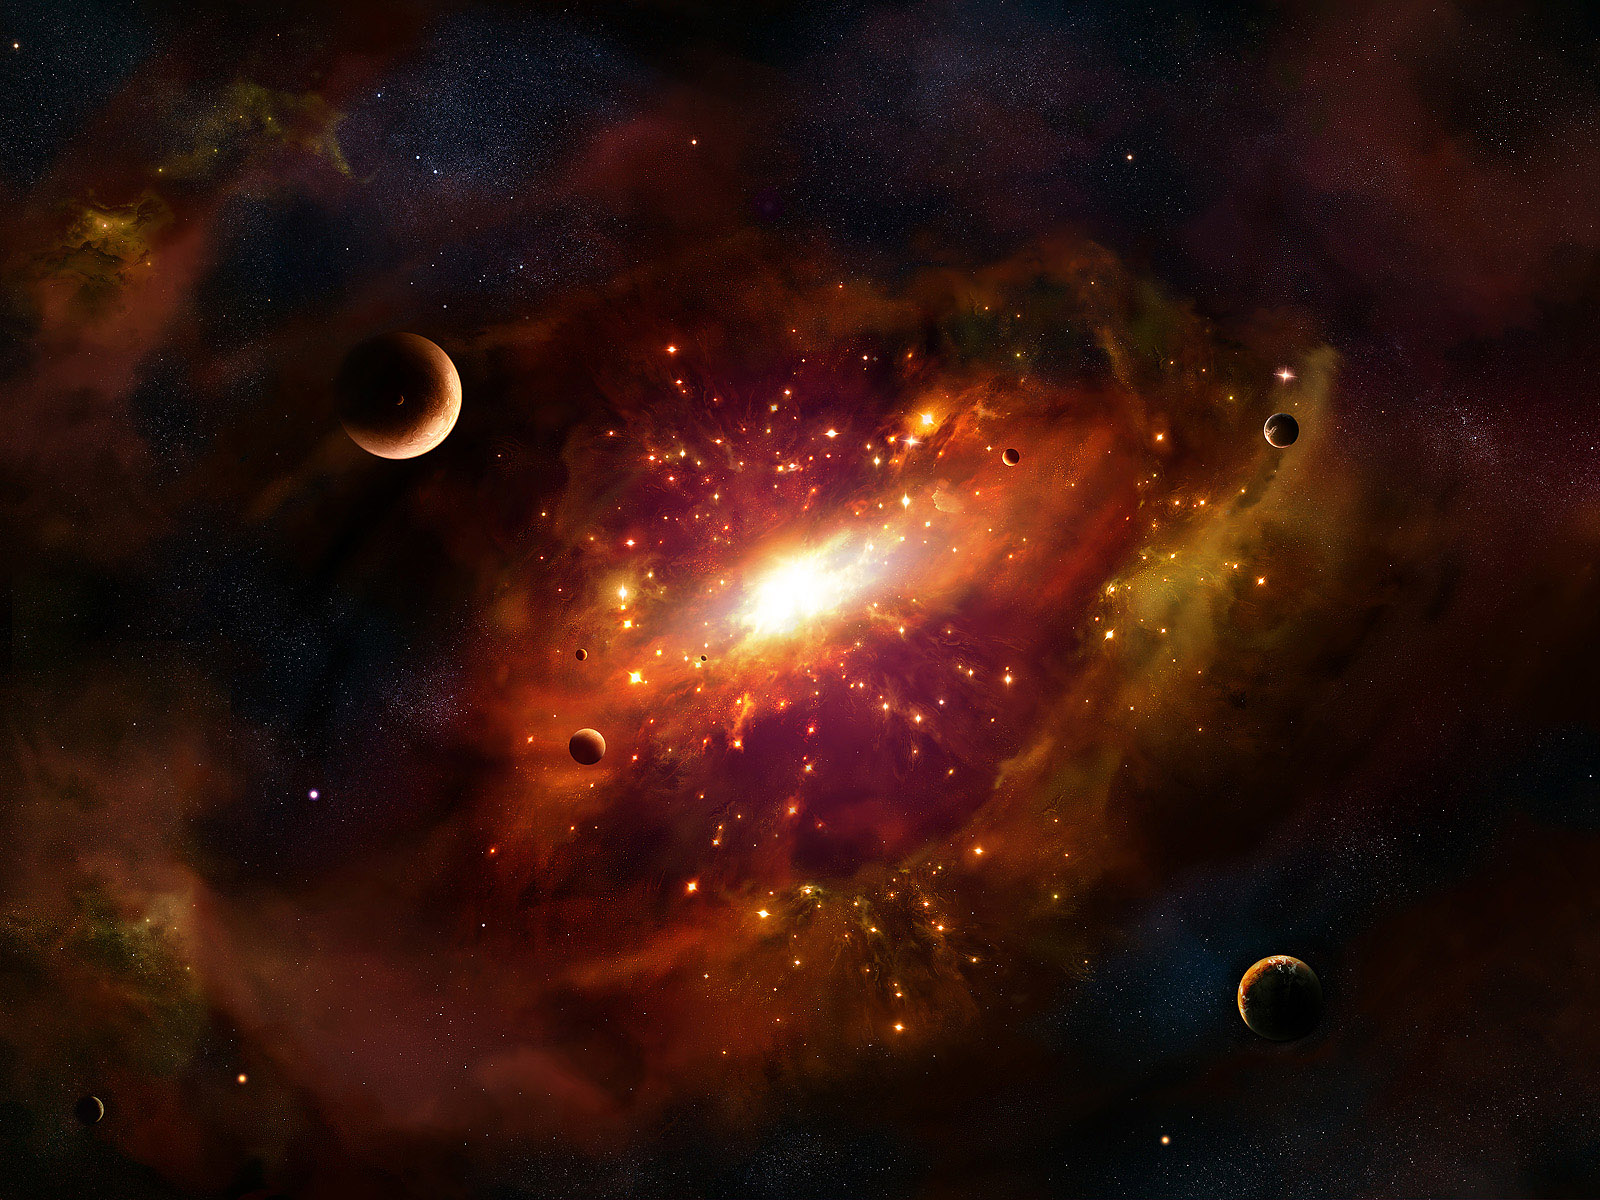 Digital Universe 122   Space Photography Desktop Wallpapers 31118 1600x1200